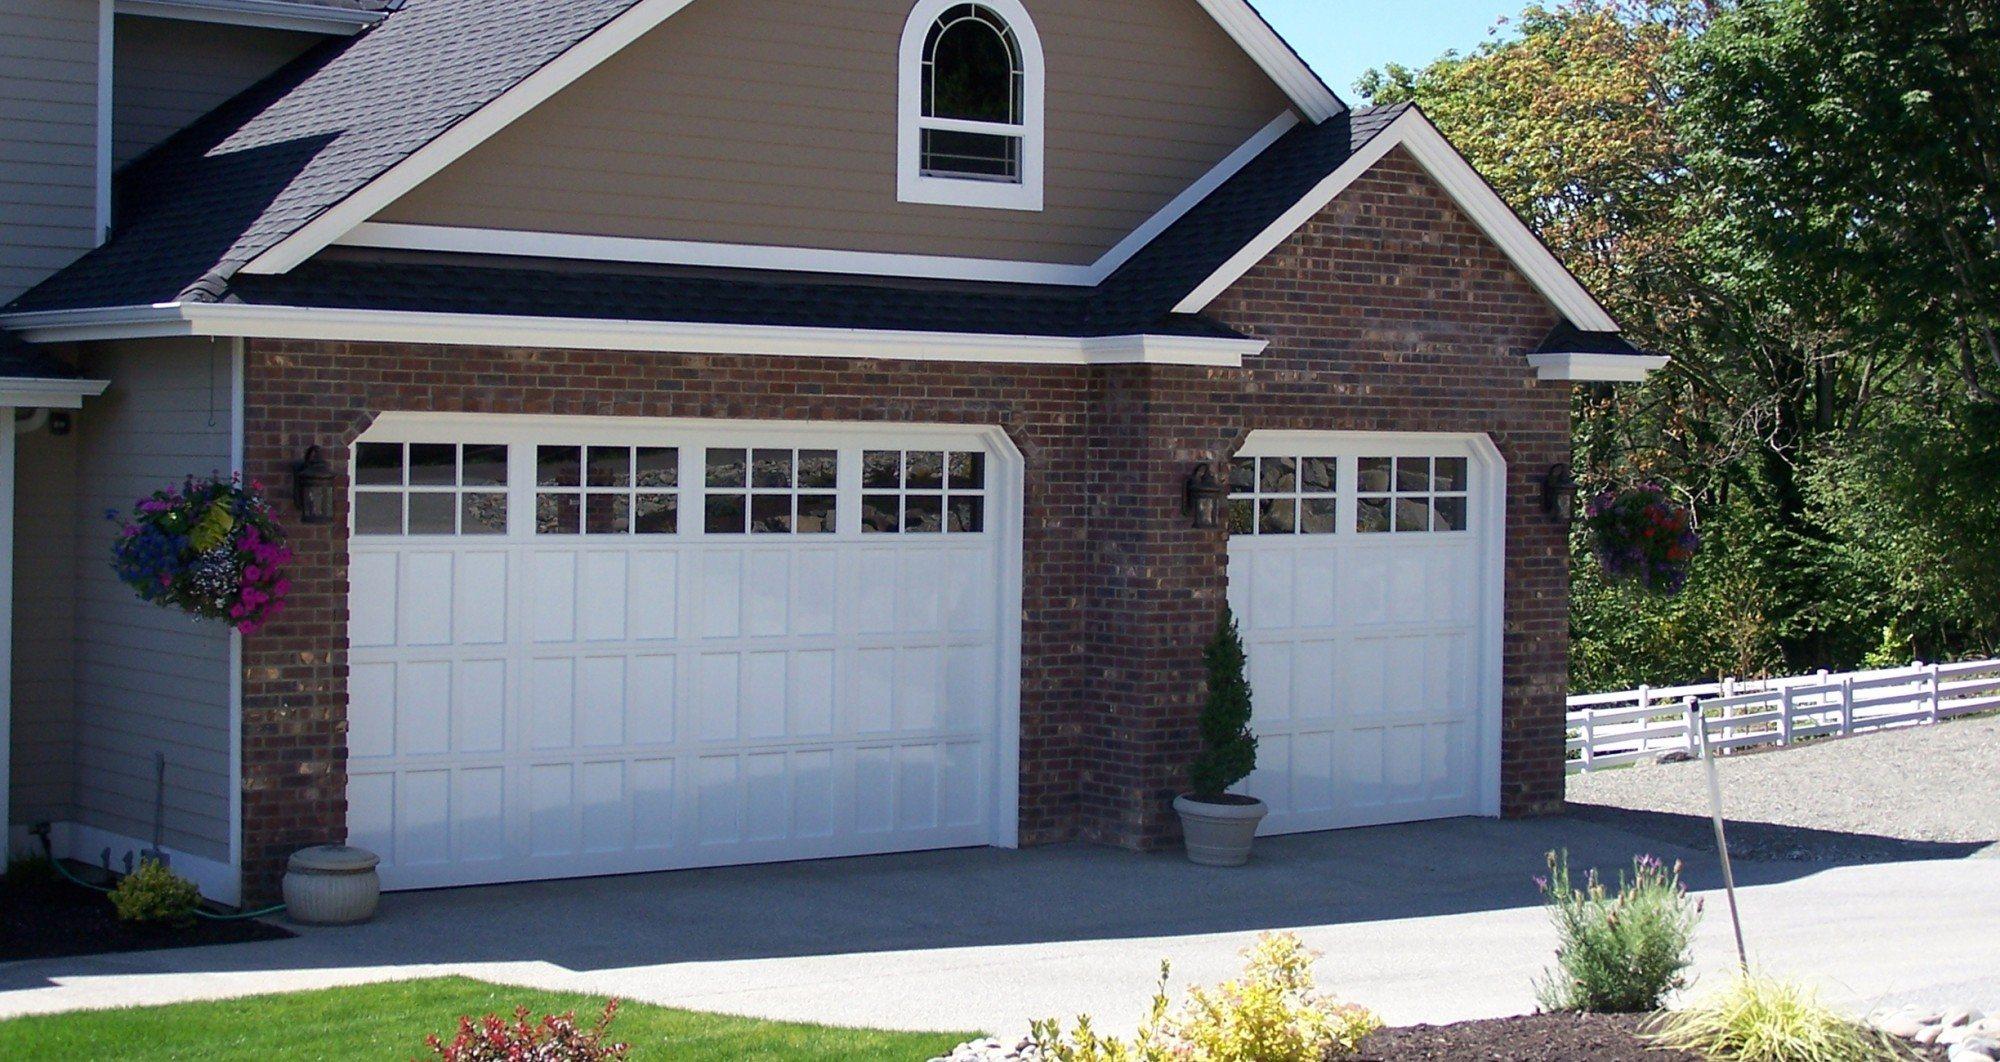 Merveilleux White Classic Garage Doors At Oregon City ...